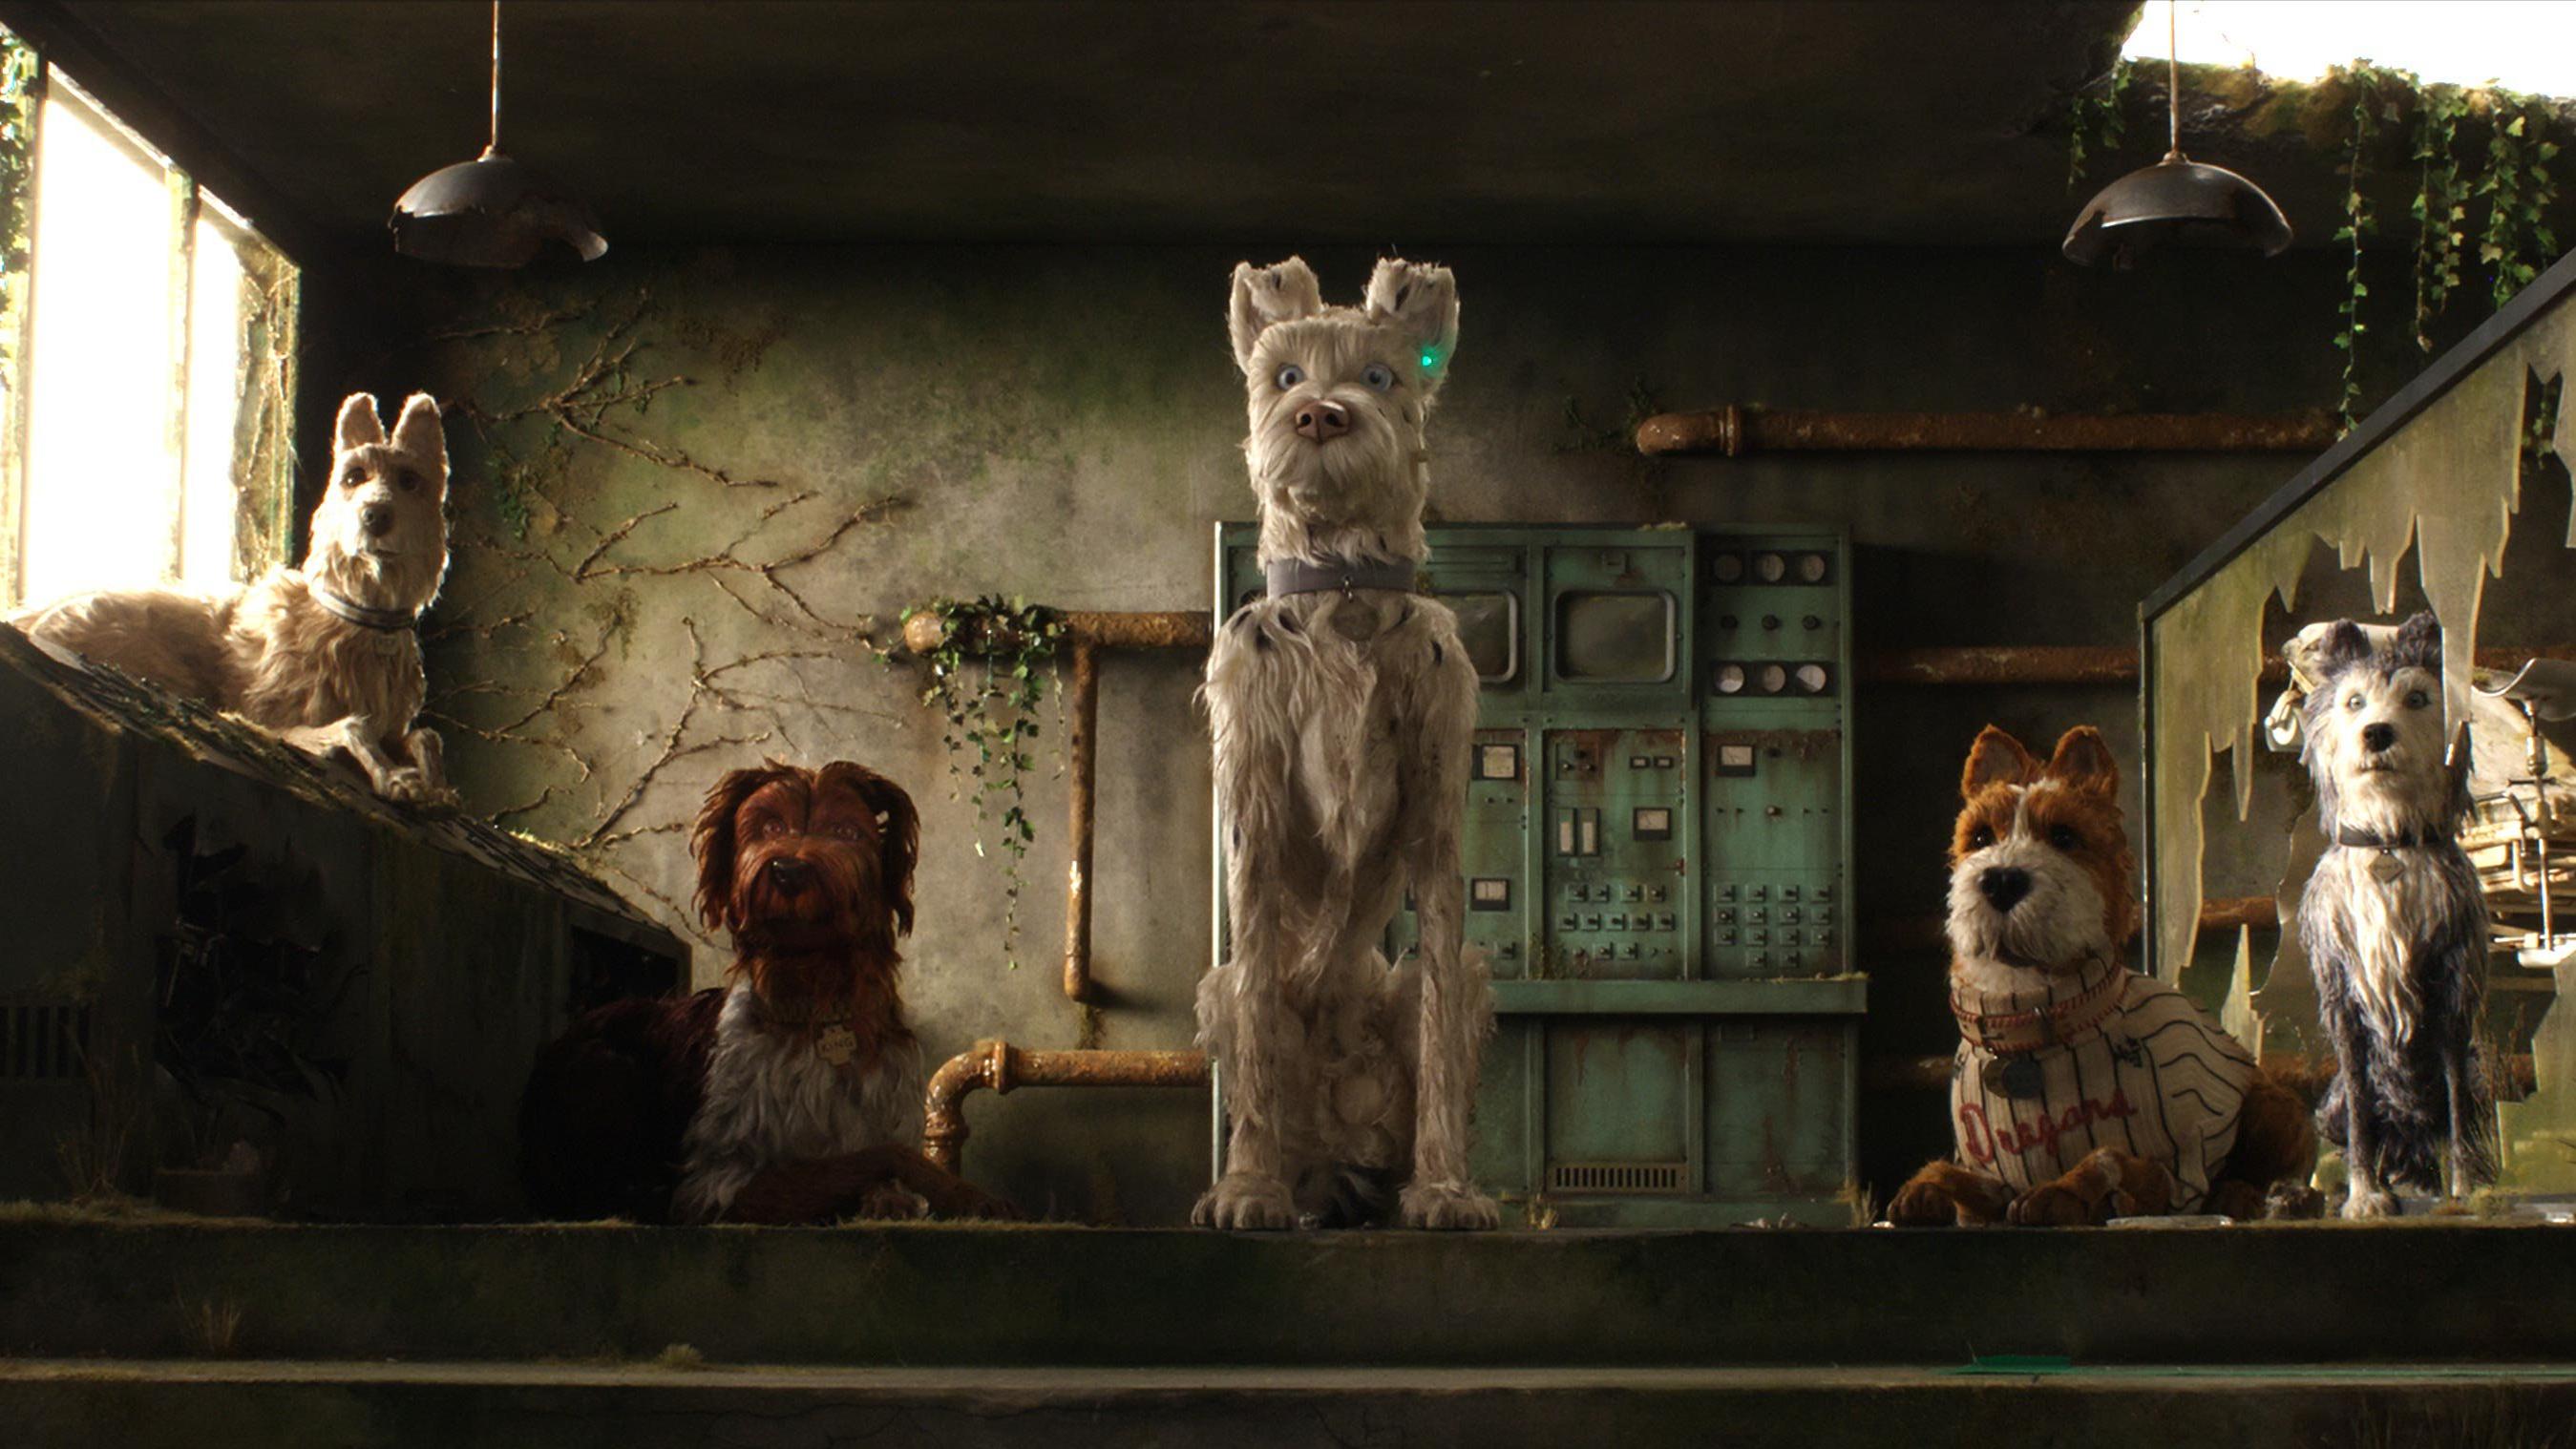 isle-of-dogs-000_img_3591_rgb-1642626814-1518711265795.jpg